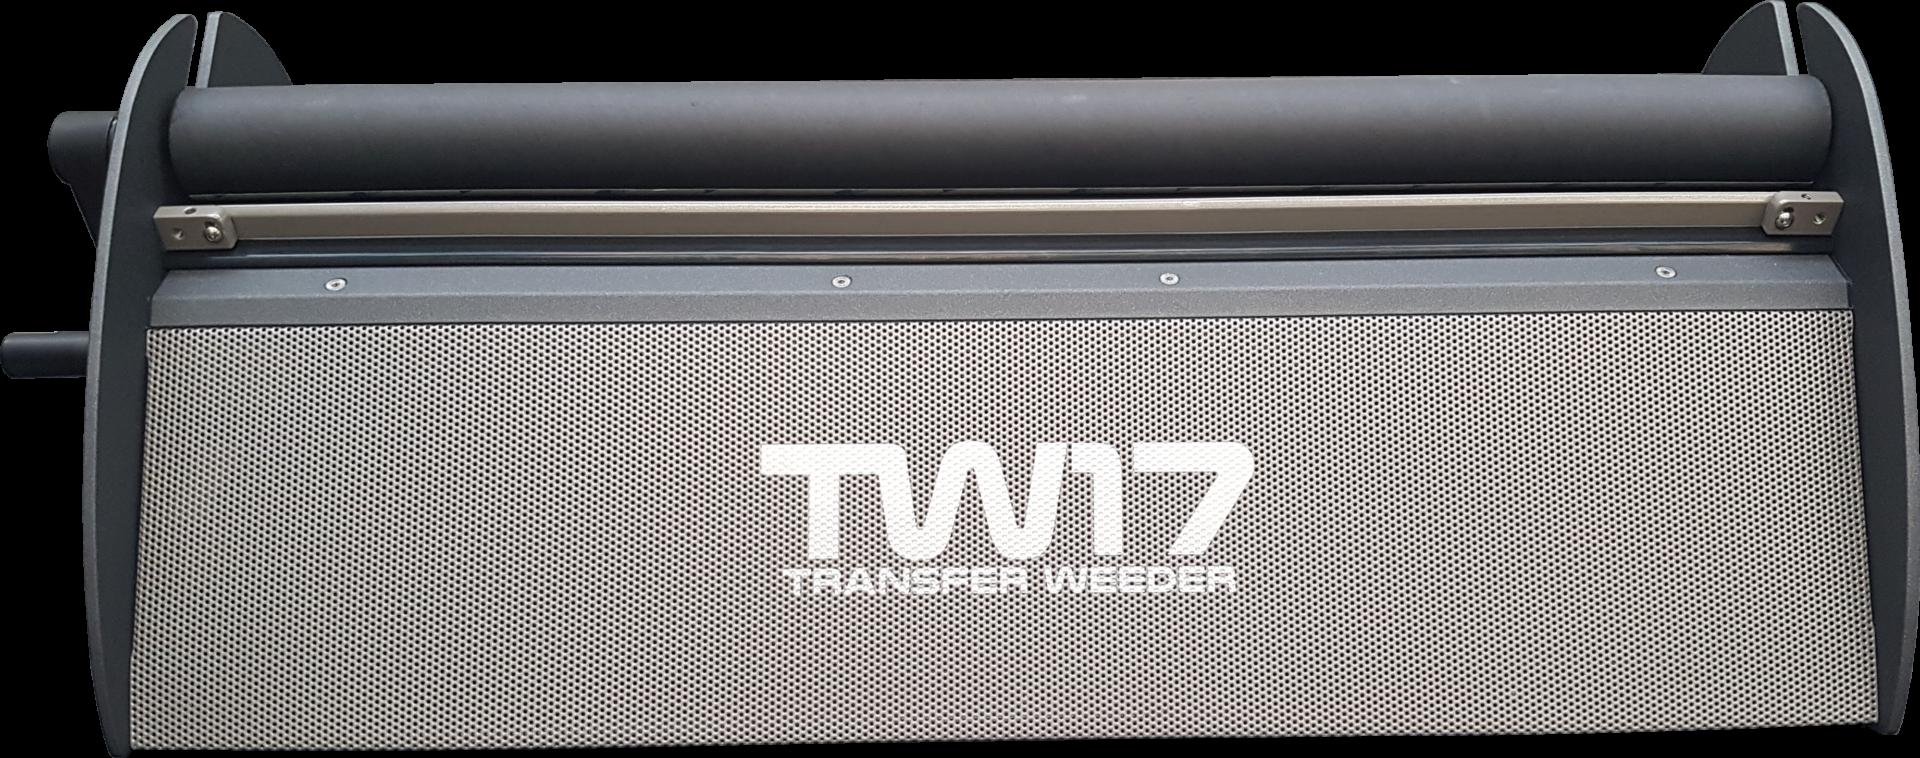 TW17 transferweeder product